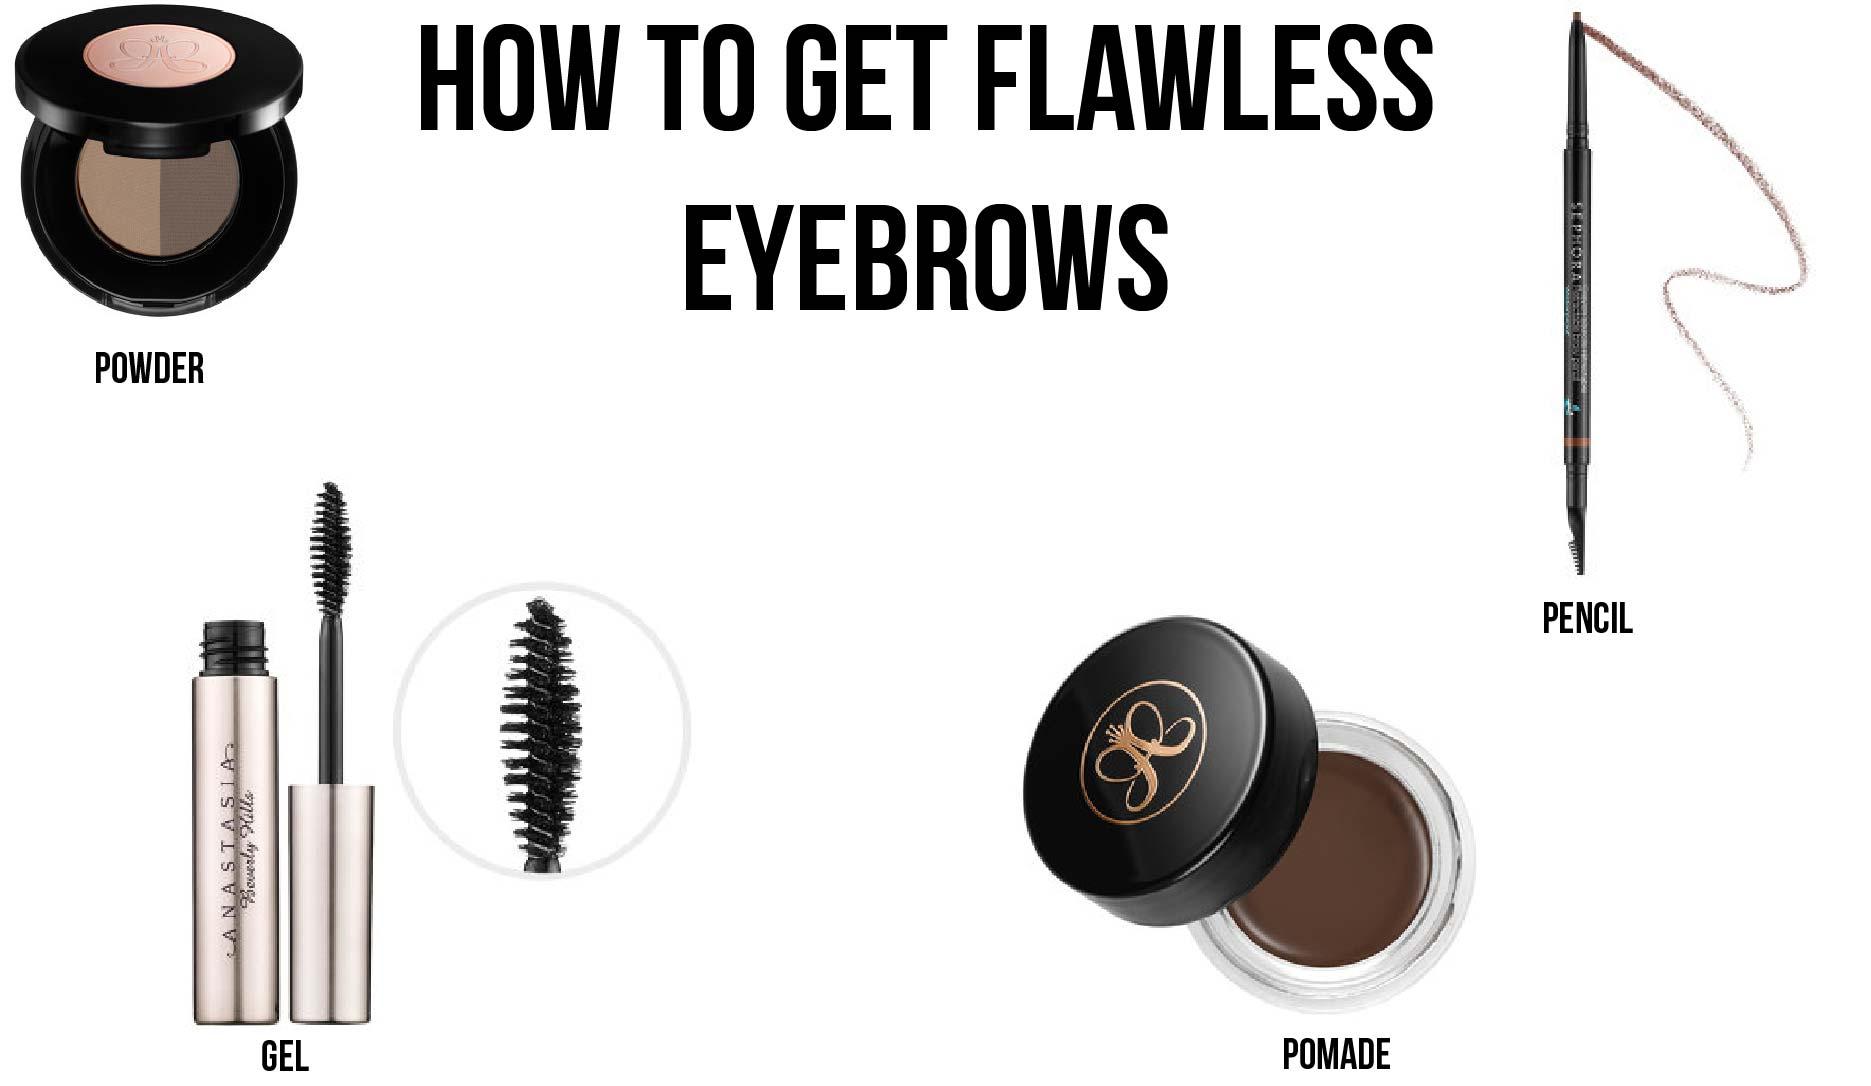 flawlesseyebrows